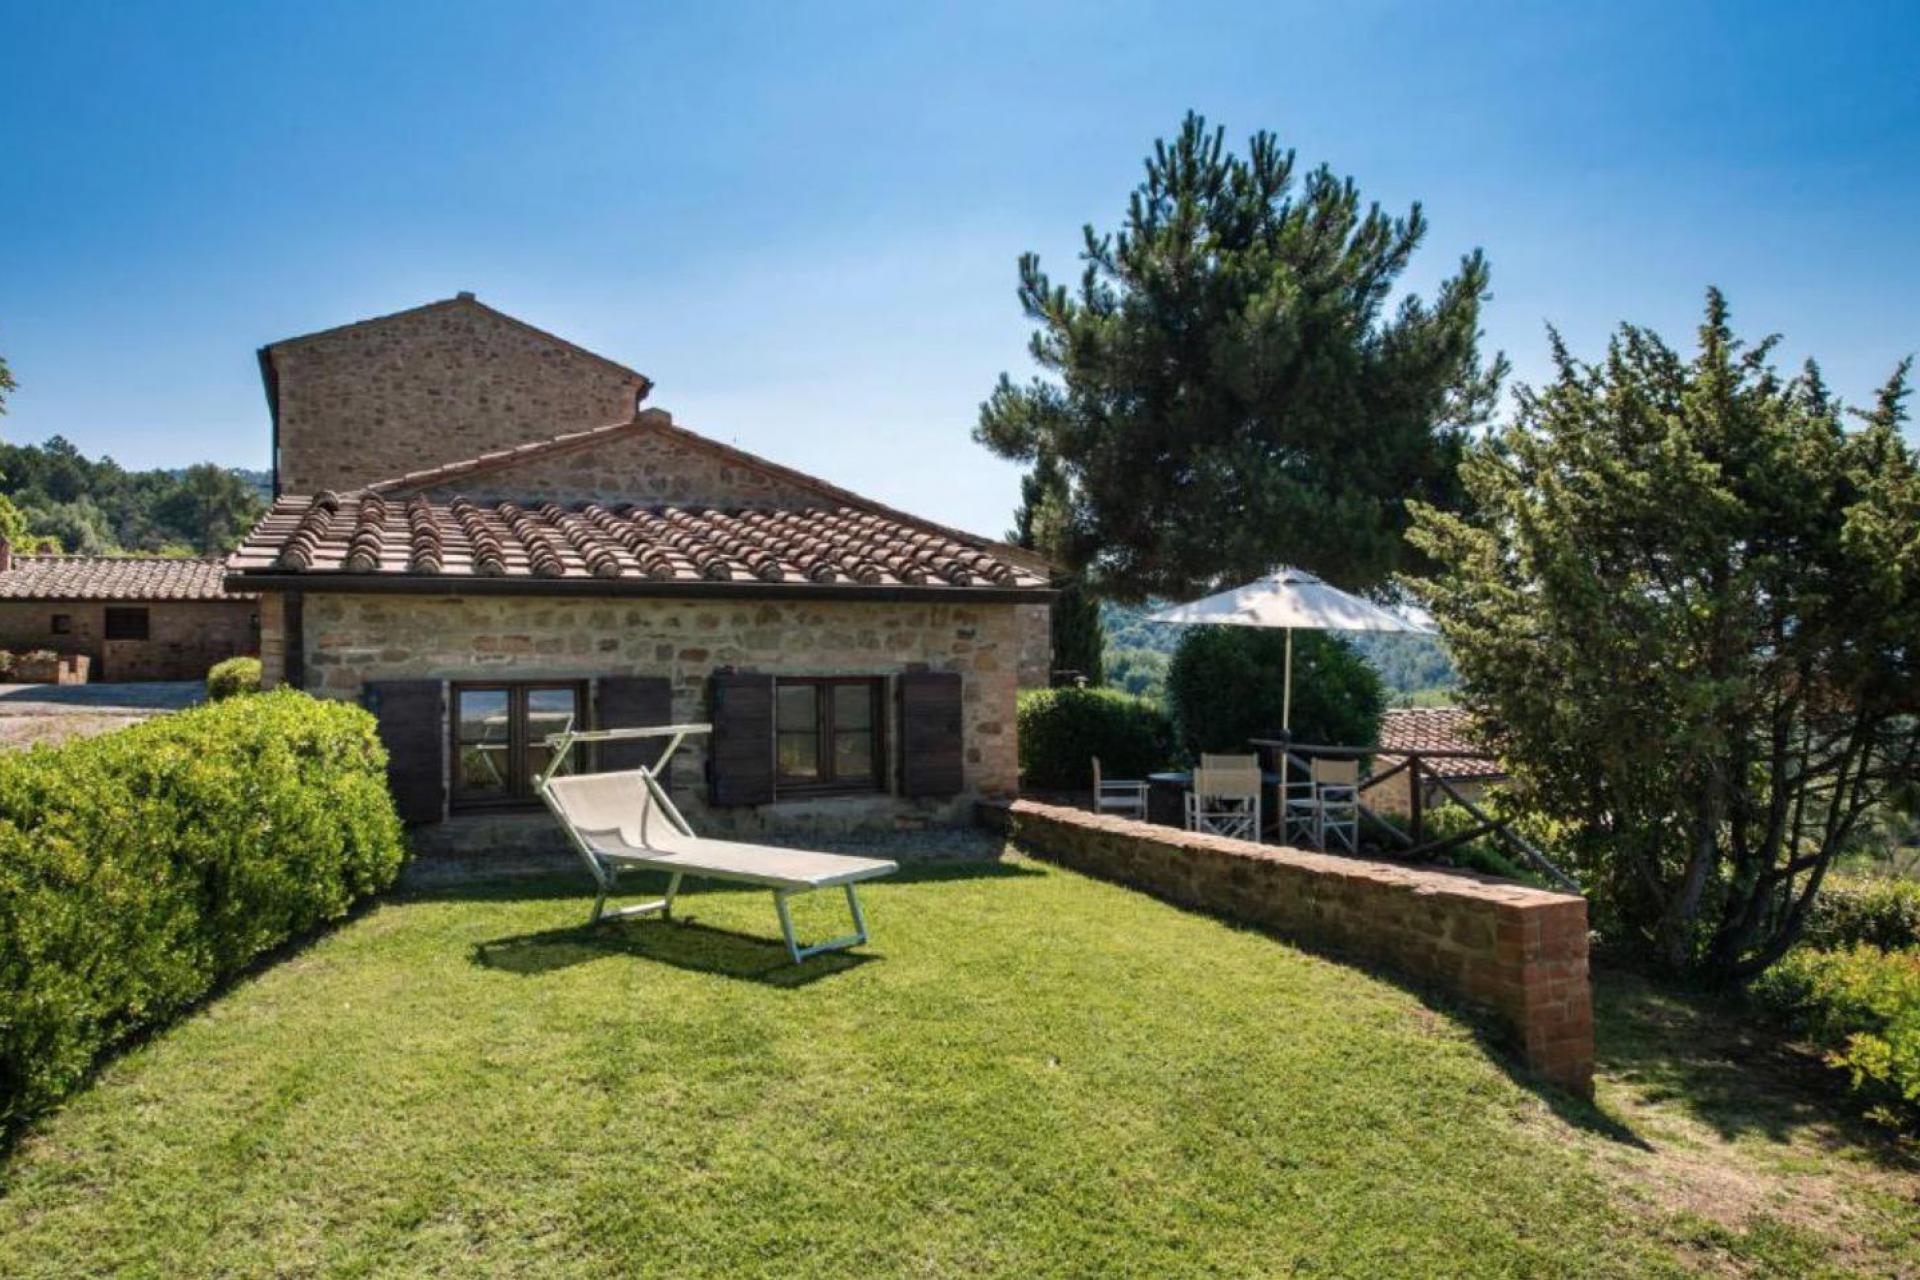 Agriturismo Toskana Sehr gastfreundliche Unterkunft - Nähe San Gimignano | myitalyselection.de